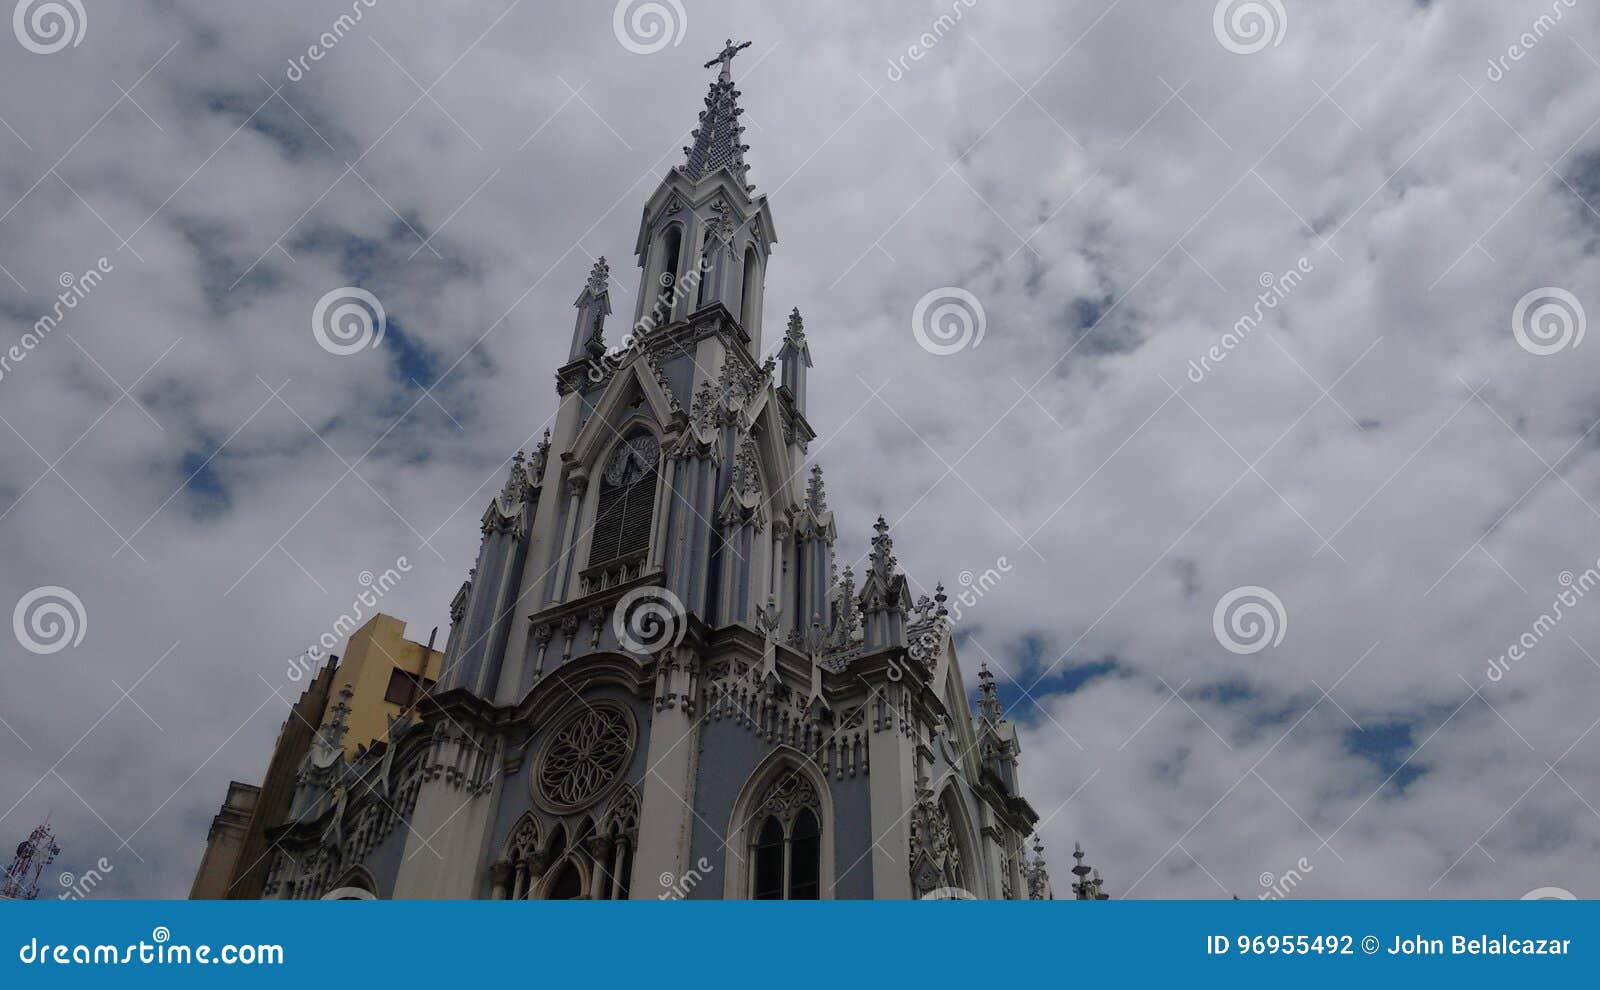 Beautiful Church in the city